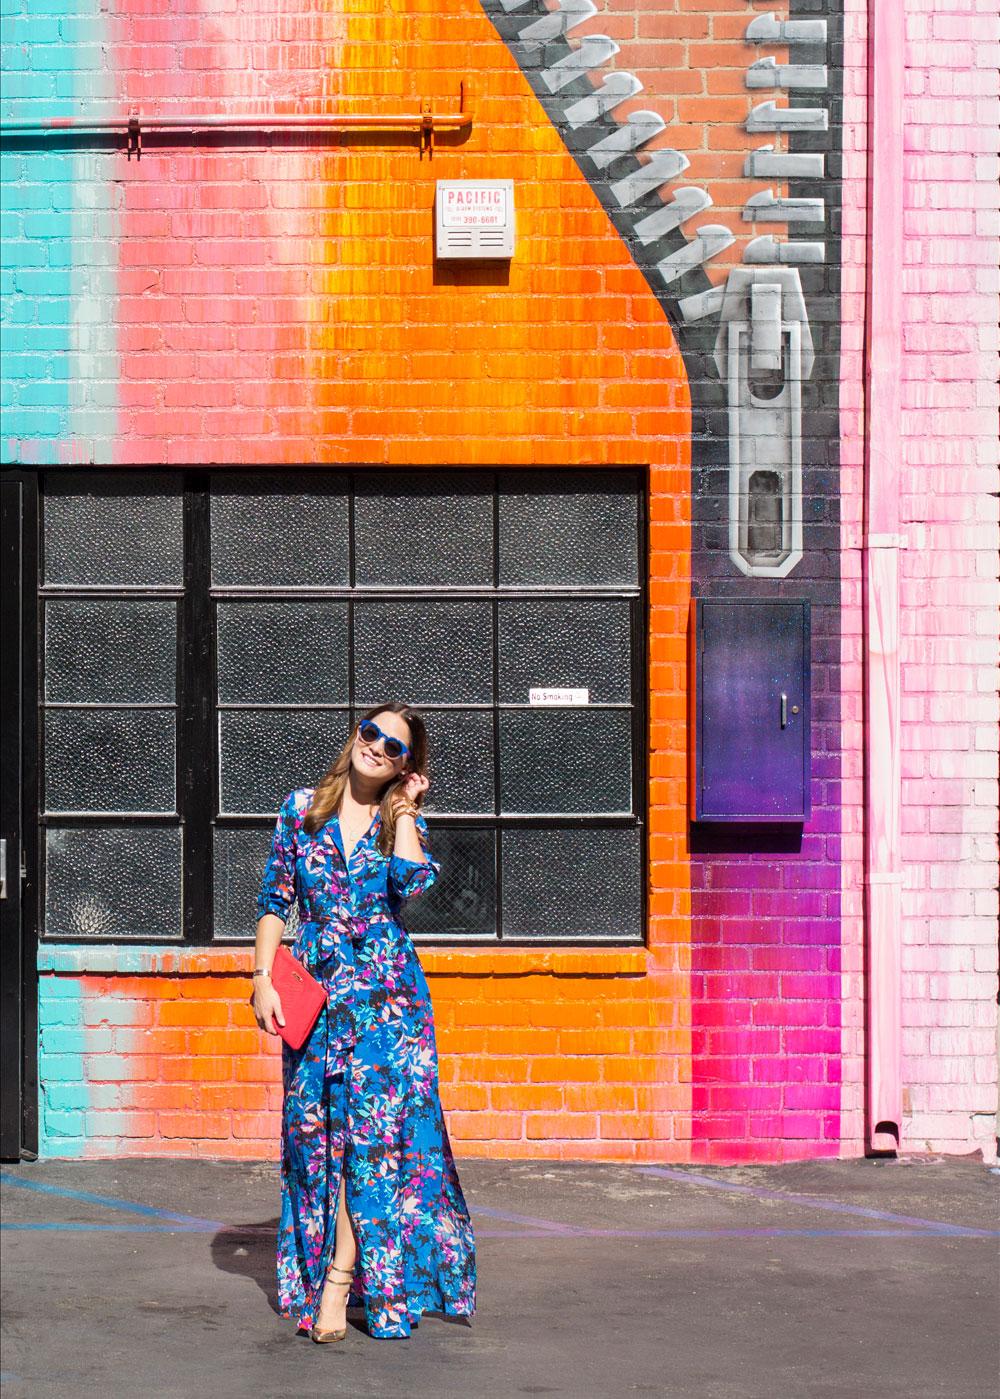 Los Angeles Murals Street Art Colorful Walls